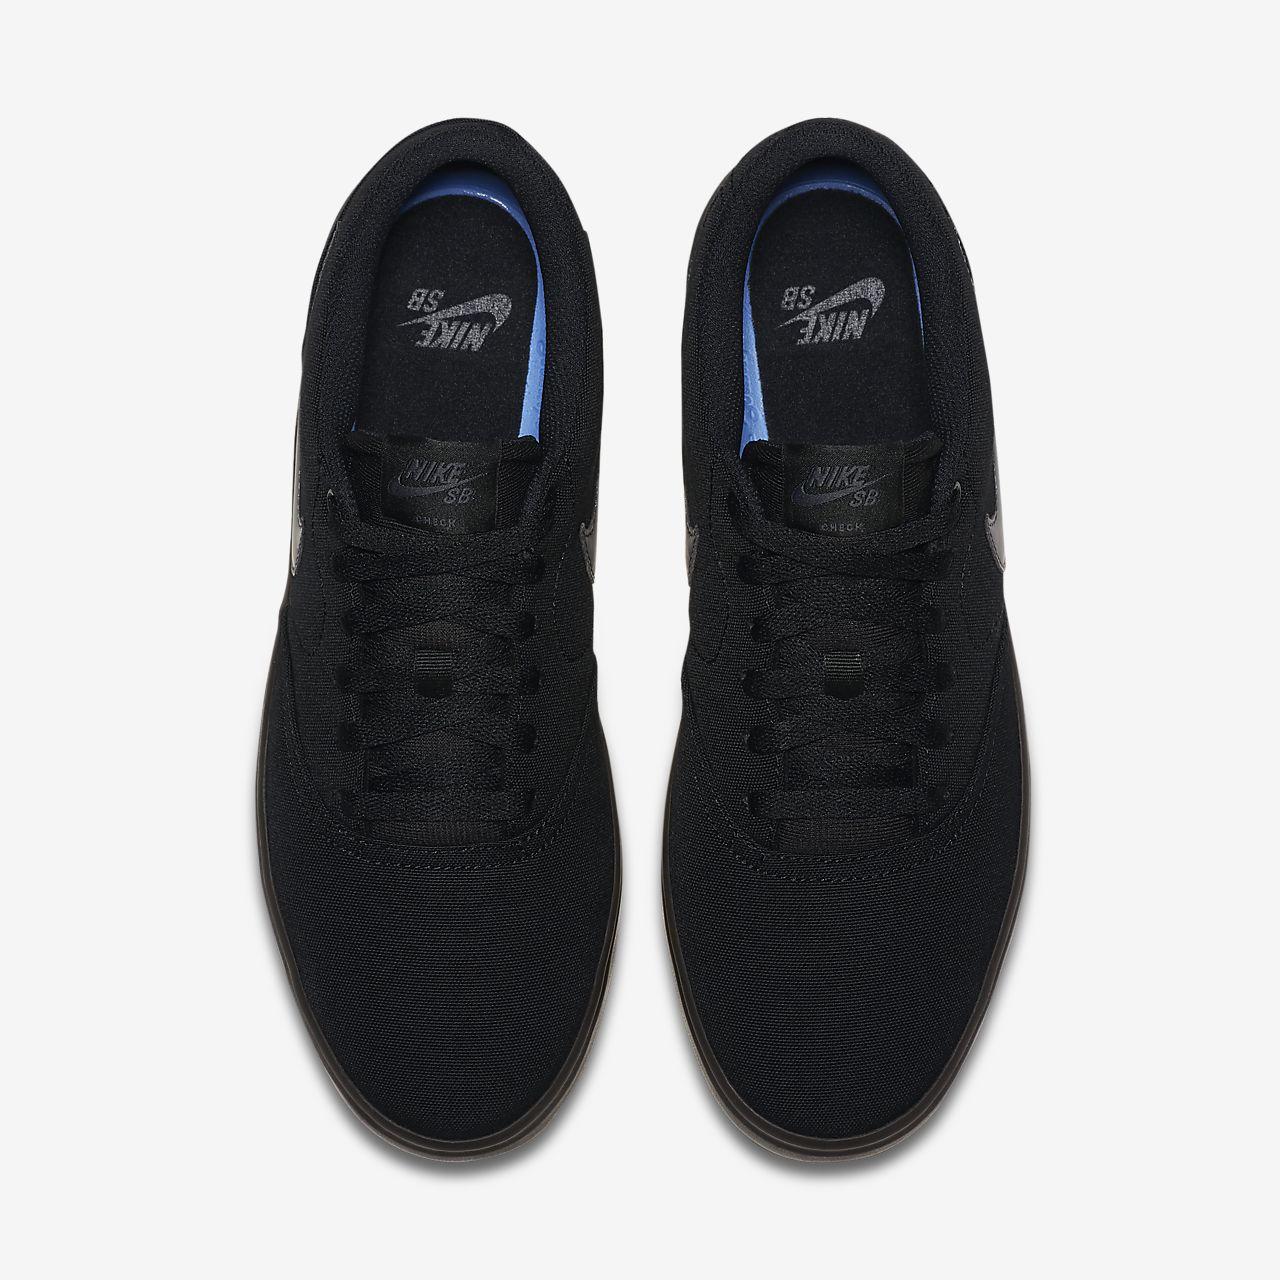 info for f5871 69062 ... Calzado de skateboarding para hombre Nike SB Check Solarsoft Canvas